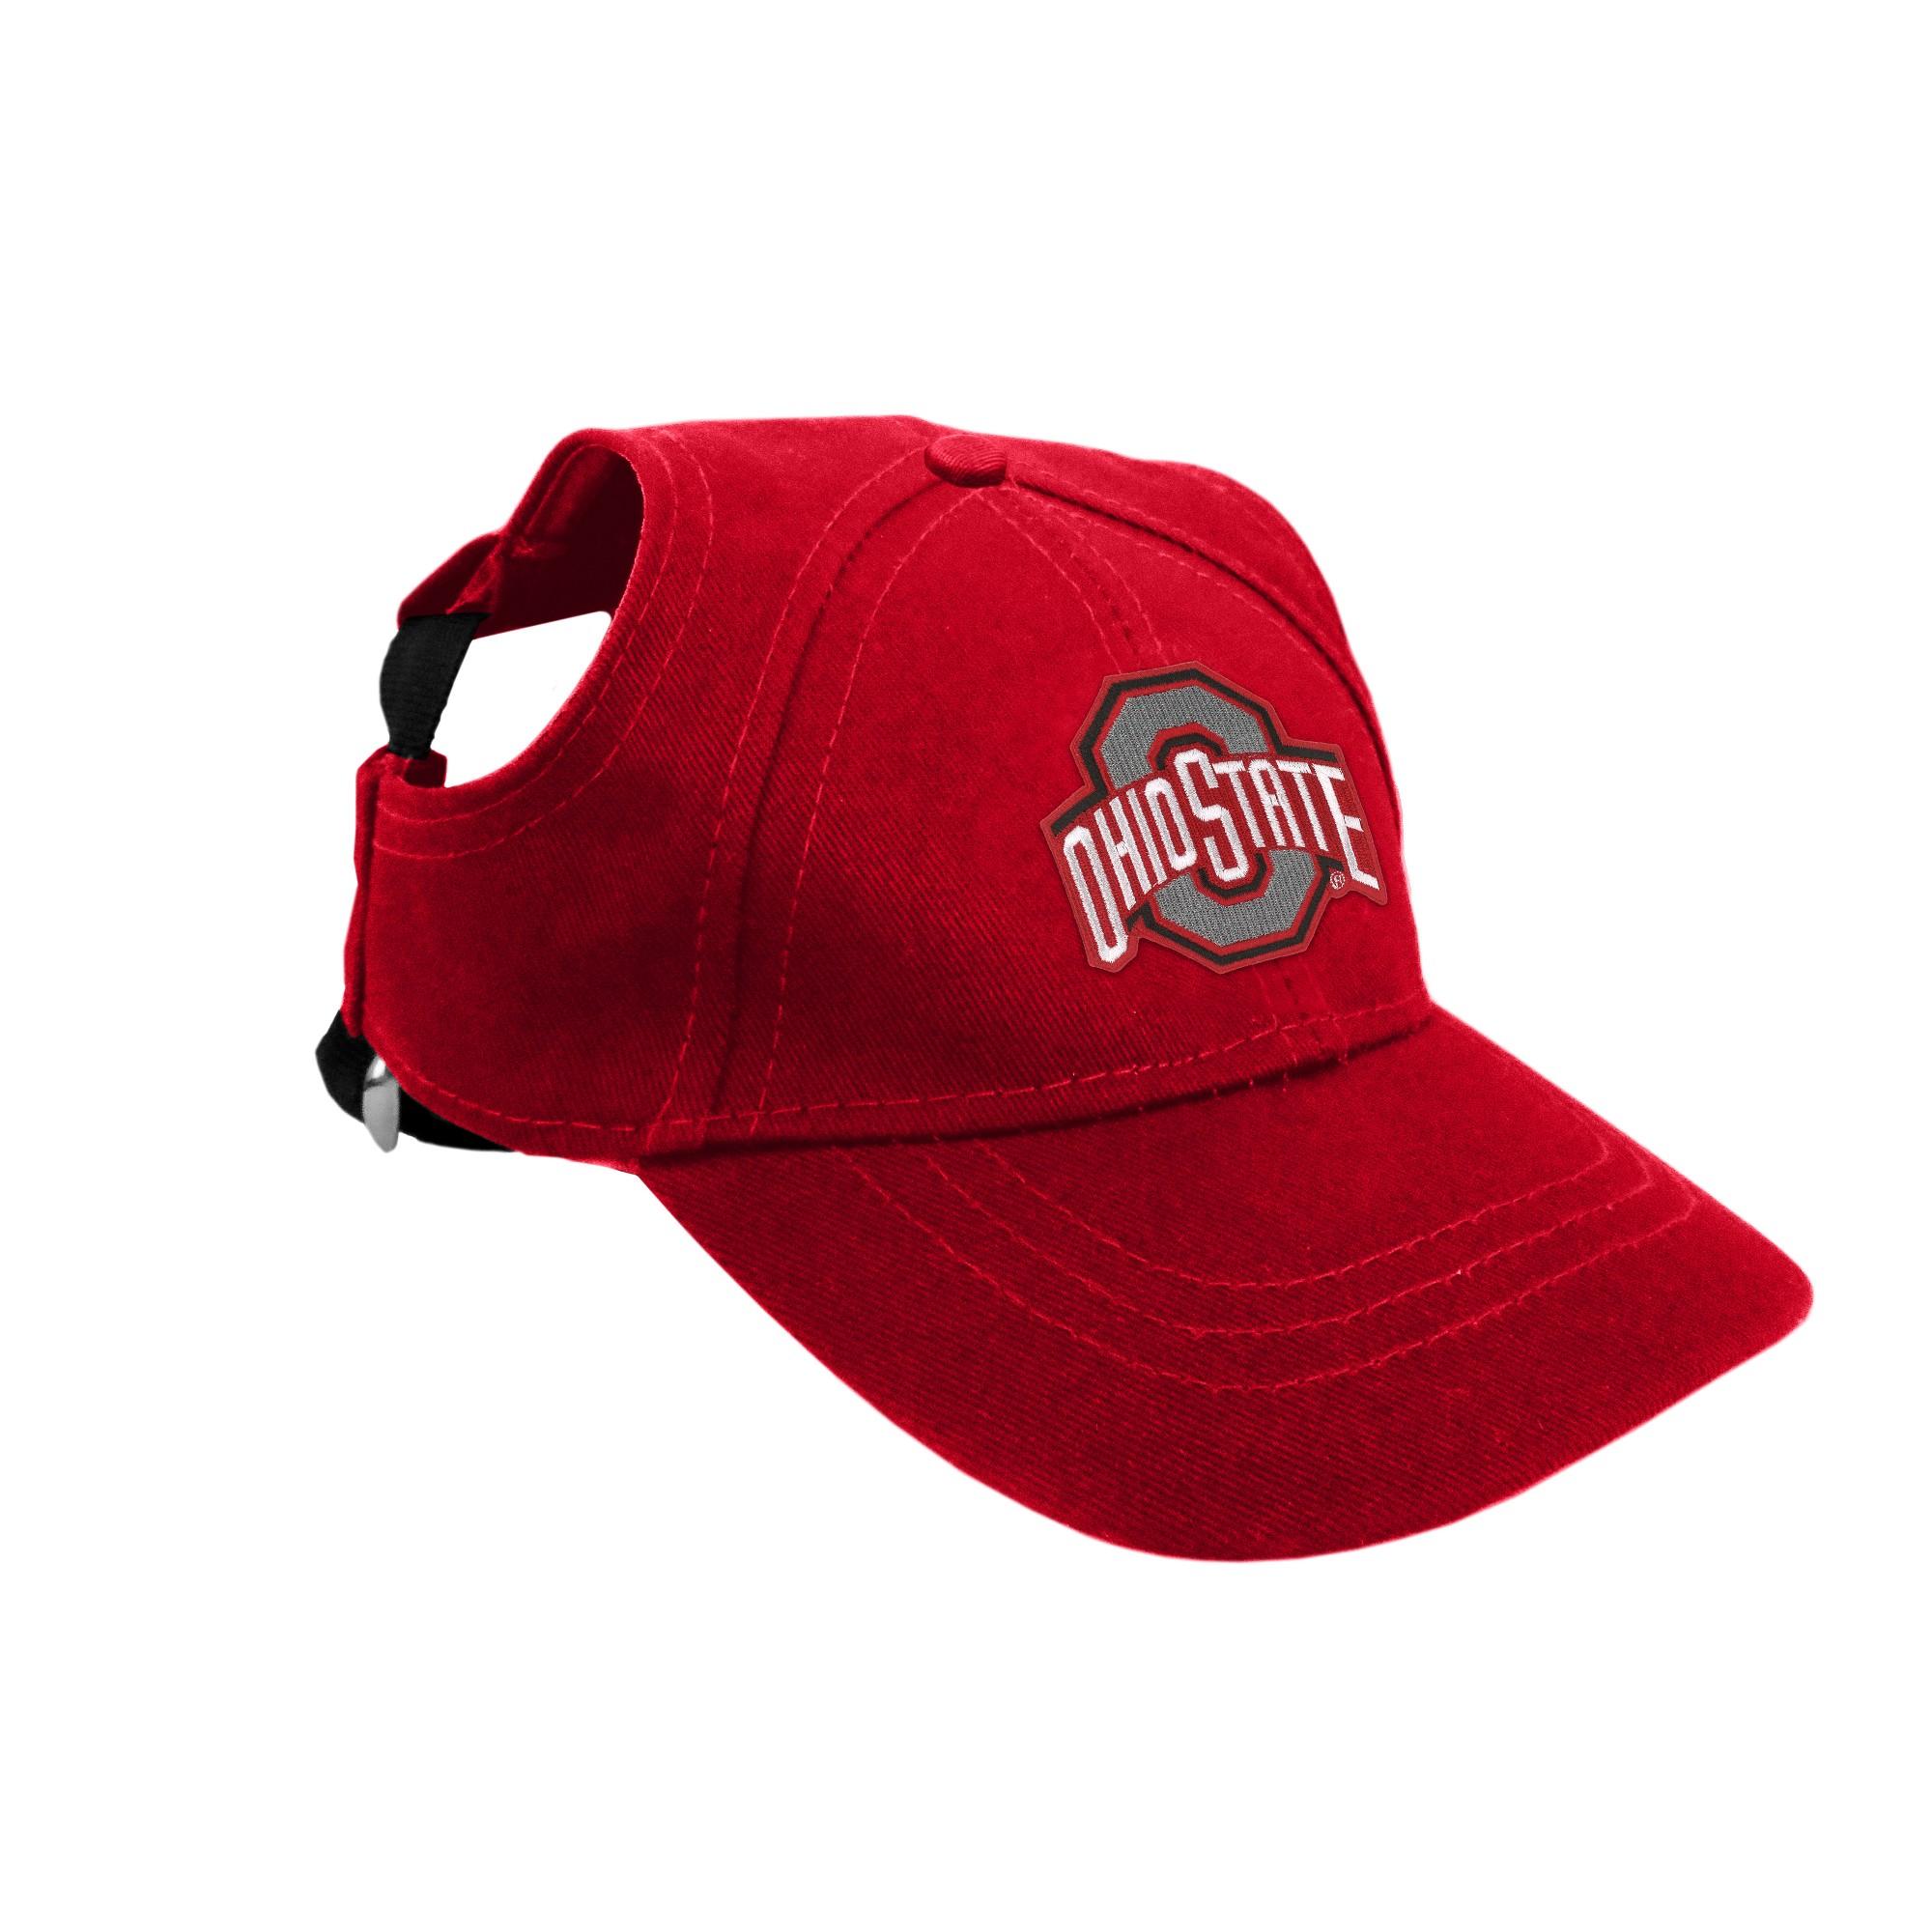 Ohio State Buckeyes Little Earth Pet Baseball Hat Xl In